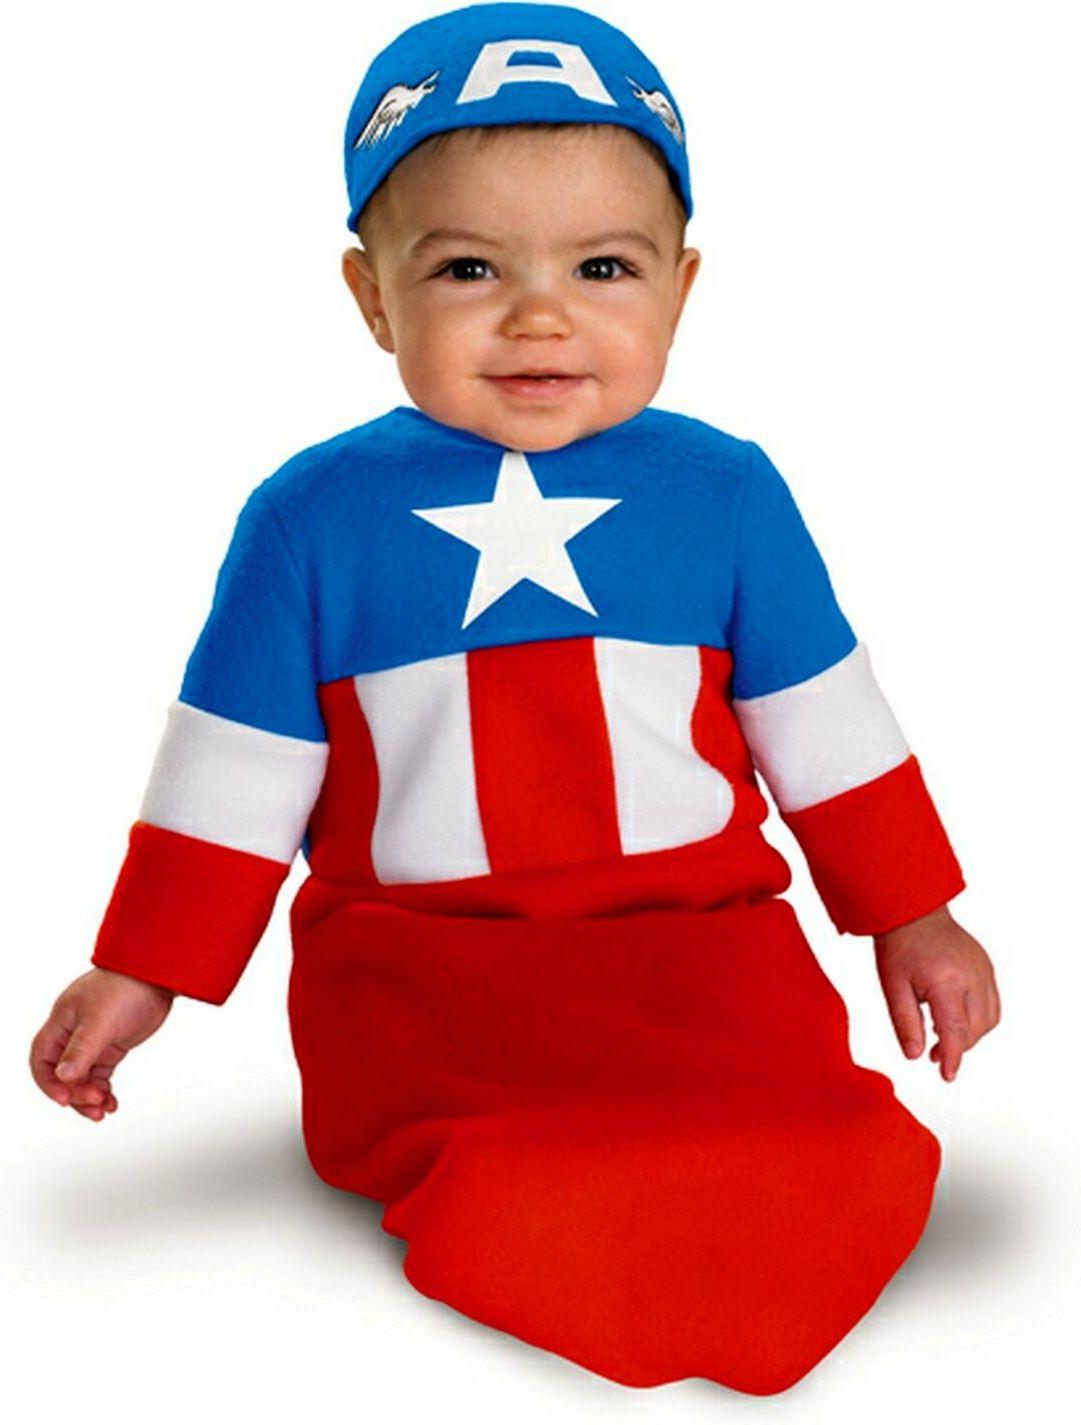 Captainamerica Baby Costume Superhero Costumes For Boys Captain America Halloween Costume Baby Superhero Costume Shop for captain marvel costumes at walmart.com. captain america halloween costume